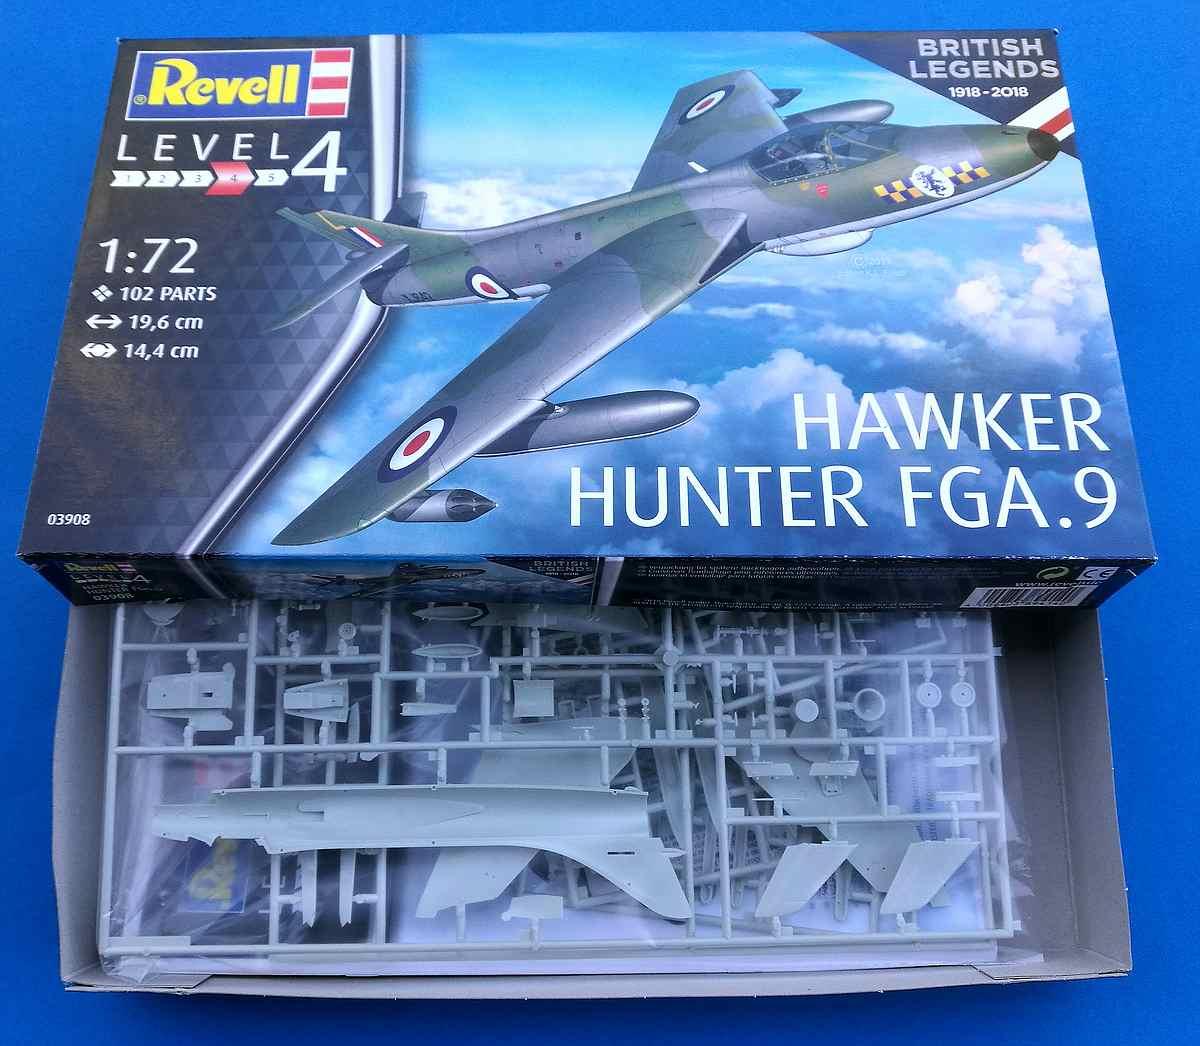 Revell-03908-Hawker-Hunter-FGA-1 Hawker Hunter FGA.9 British Legends im Maßstab 1:72 von Revell 03908